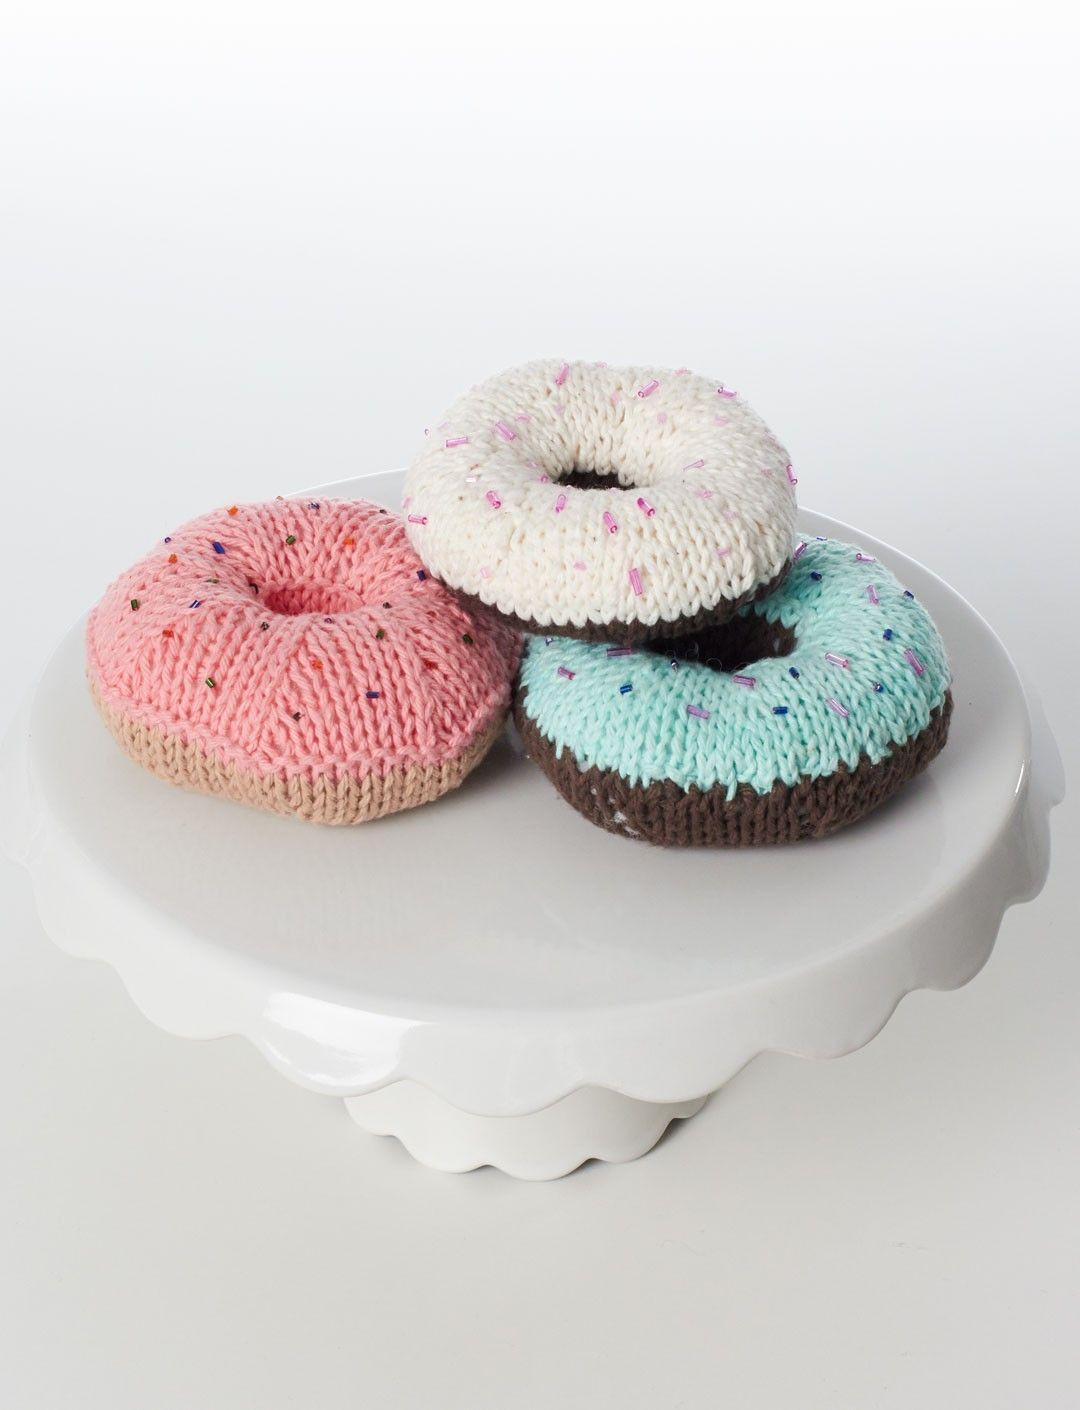 Donut knitting pattern - free   DIY   Knitting, Knitting patterns ...